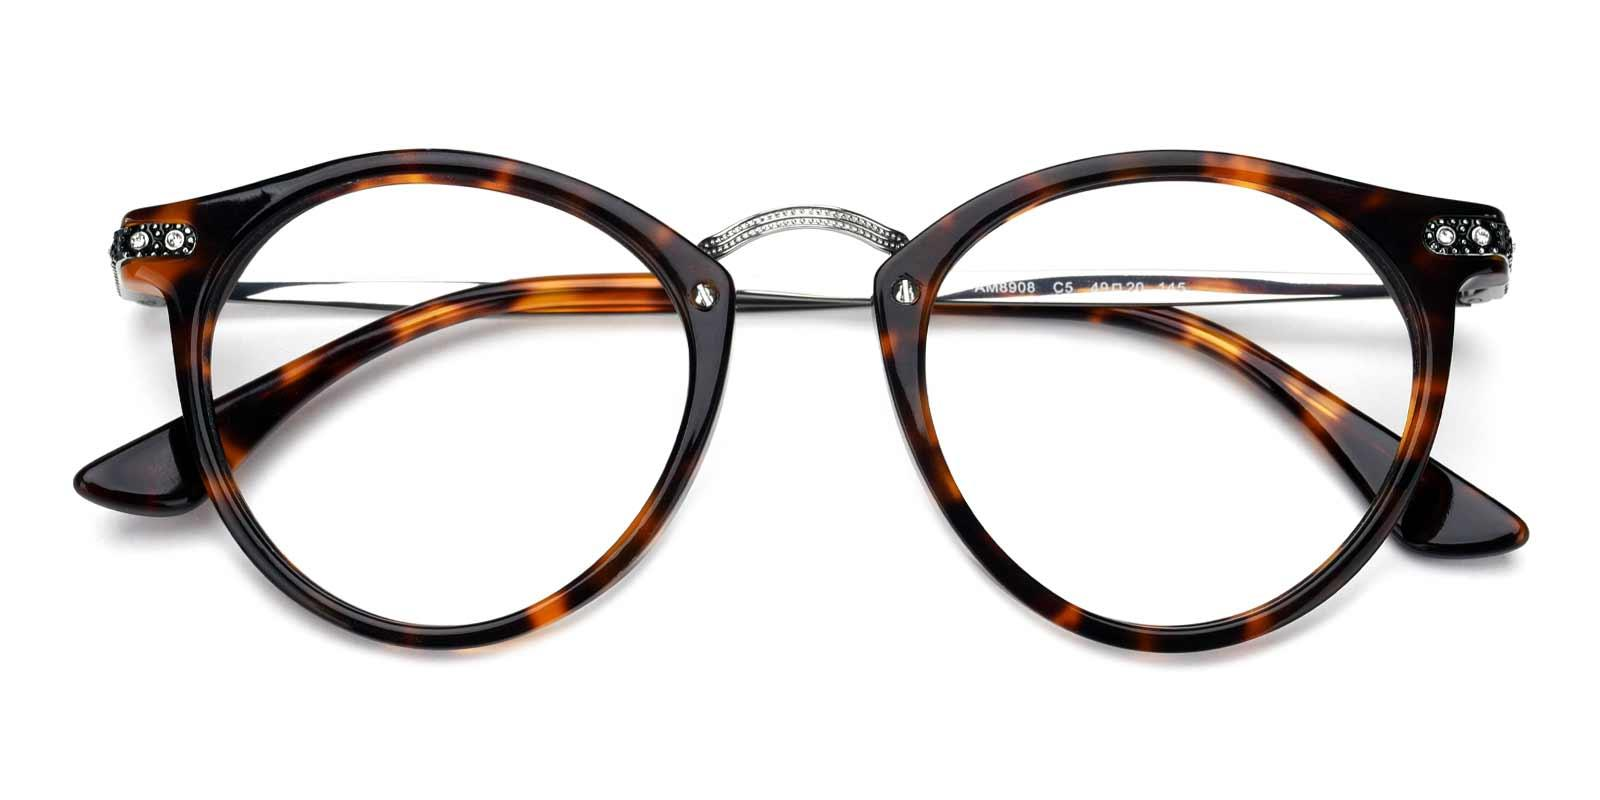 Donna-Leopard-Round-Acetate-Eyeglasses-detail